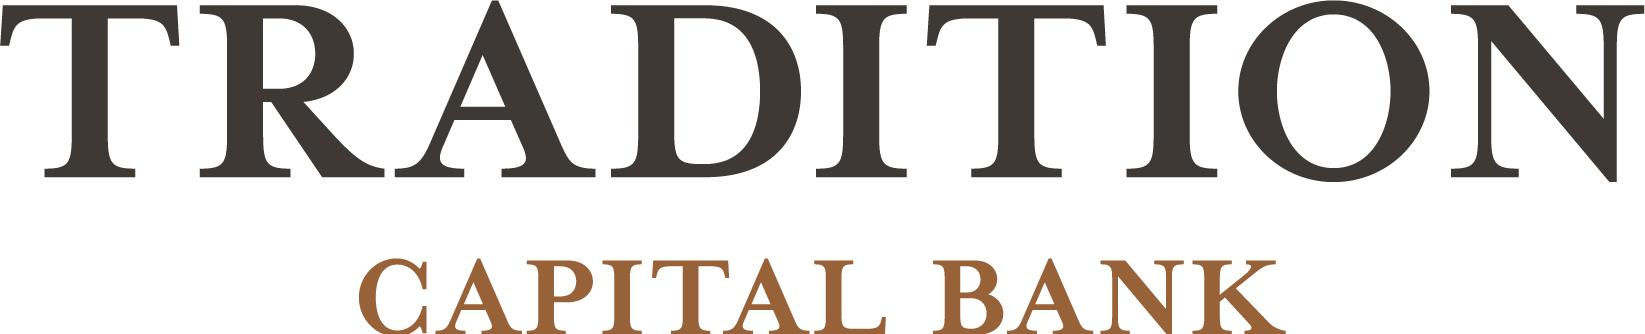 Tradition Capital Bank logo